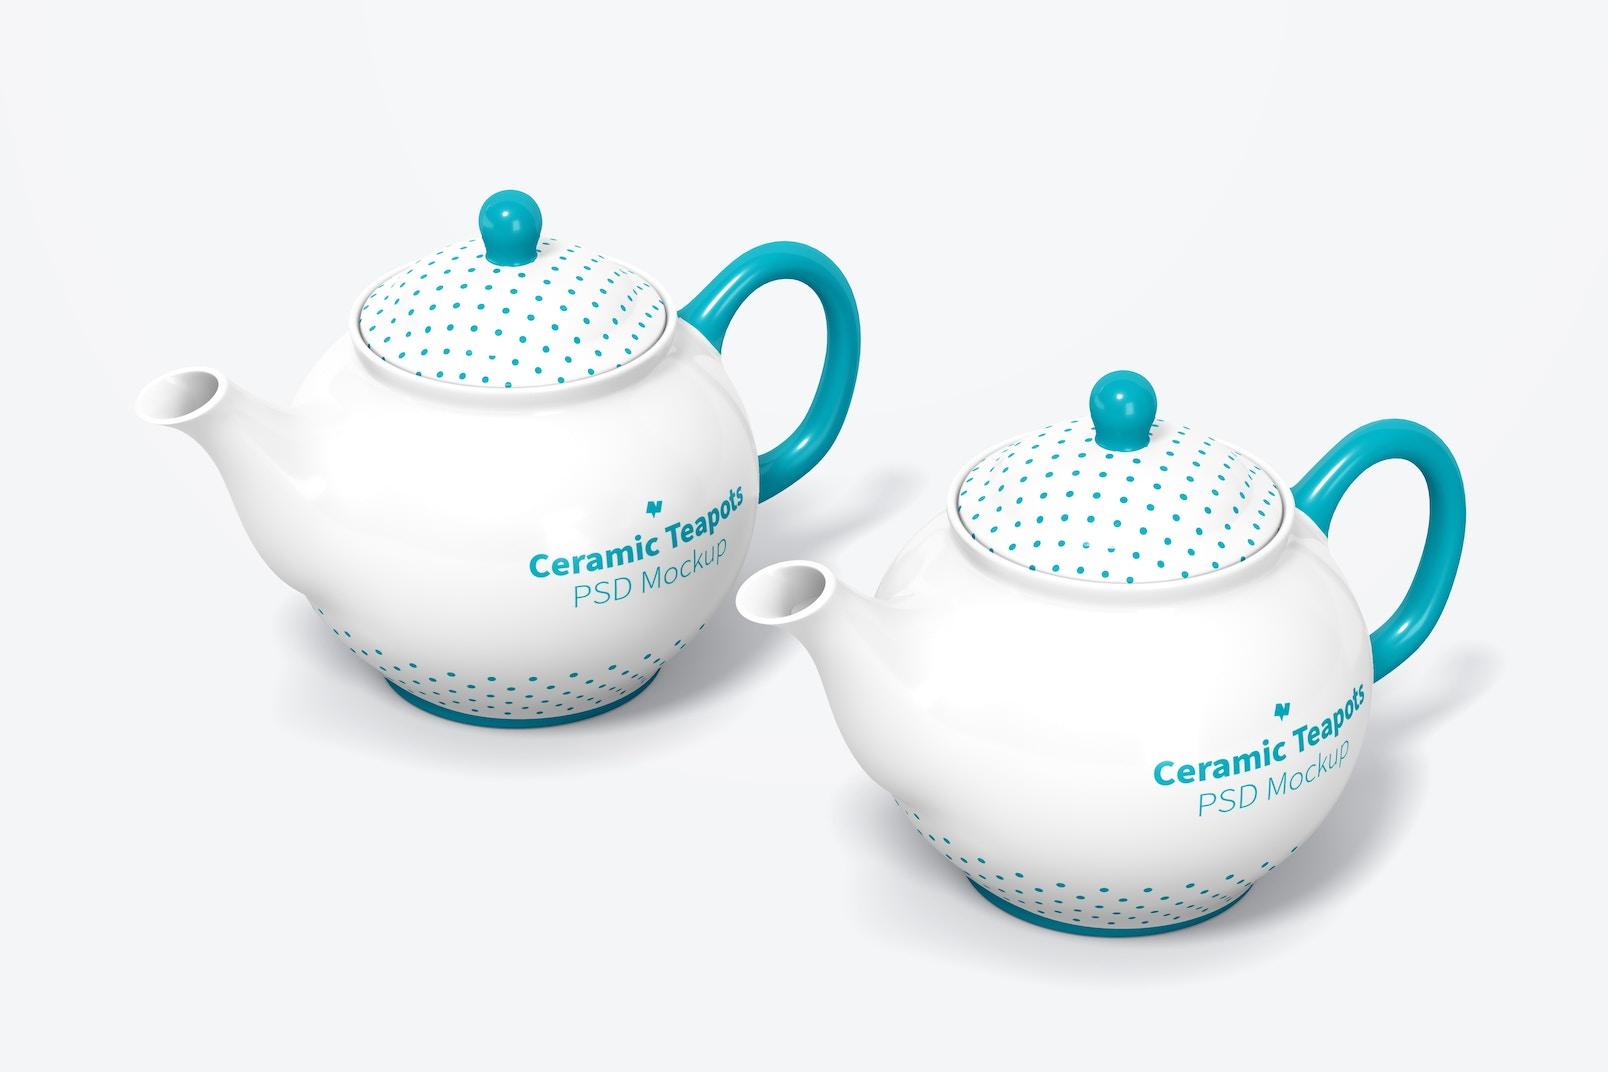 Ceramic Teapots Mockup, Perspective View